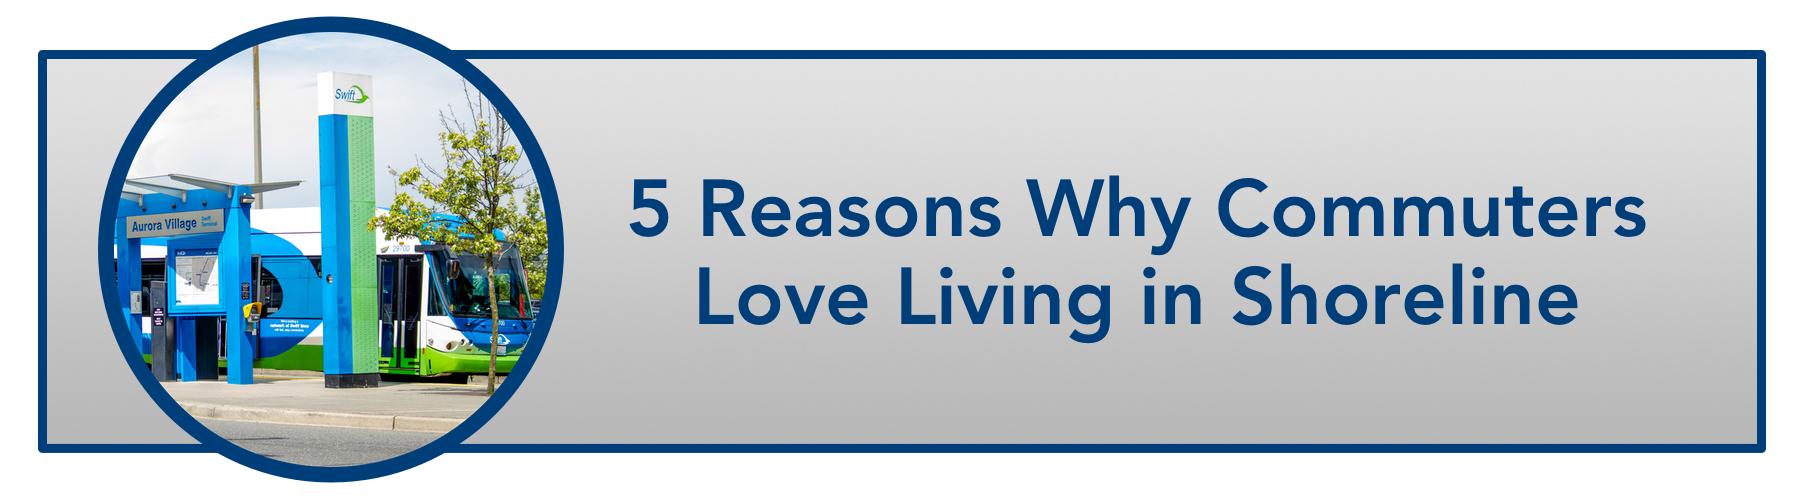 WindermereNorth_Shoreline_5 Reasons Why Commuters Love Living in Shoreline